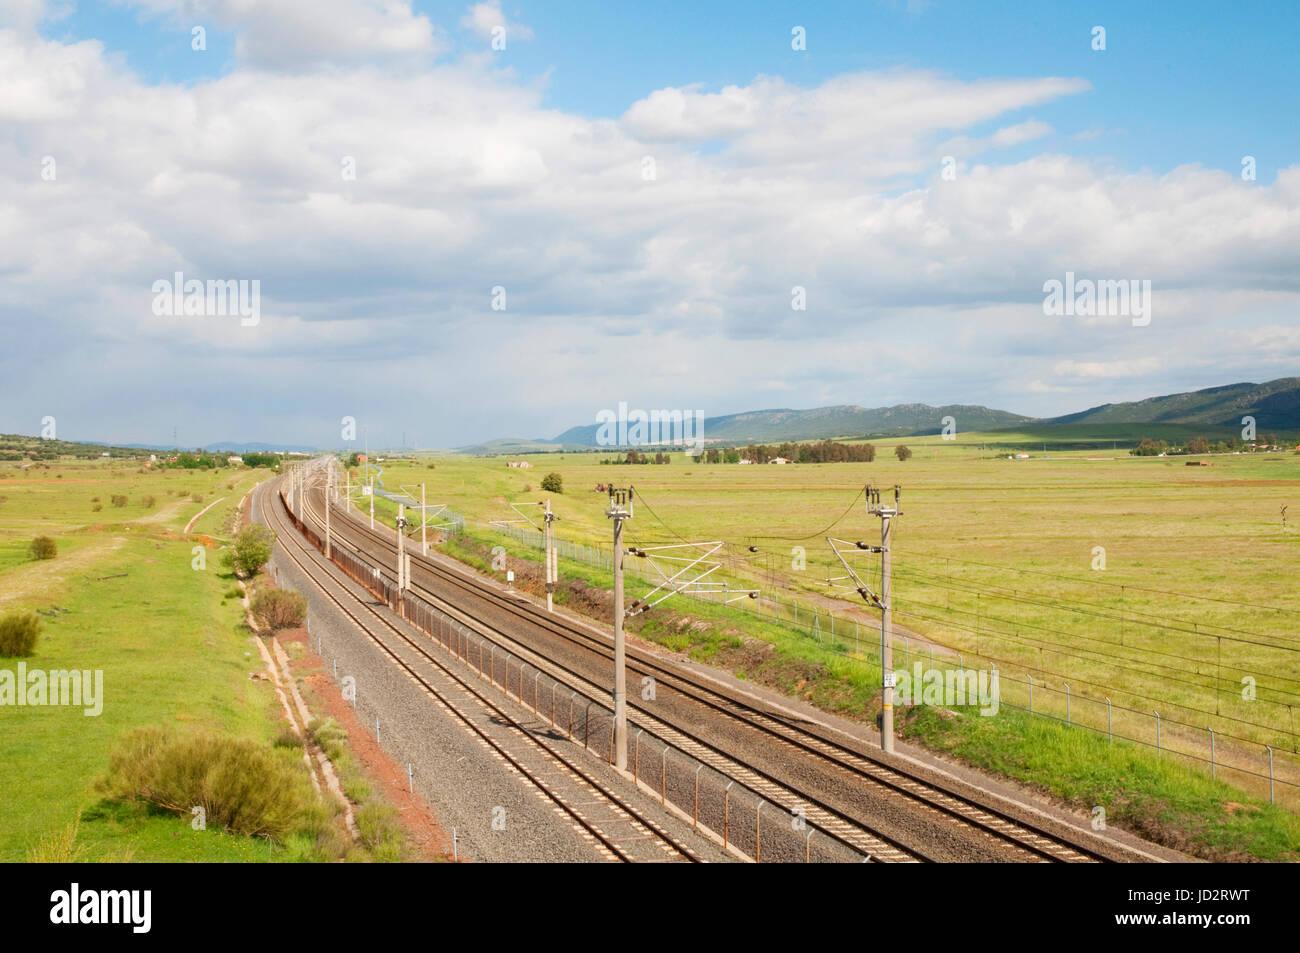 Railway tracks, AVE High-speed train Madrid-Sevilla. Puertollano, Ciudad Real province, Castilla La Mancha, Spain. - Stock Image